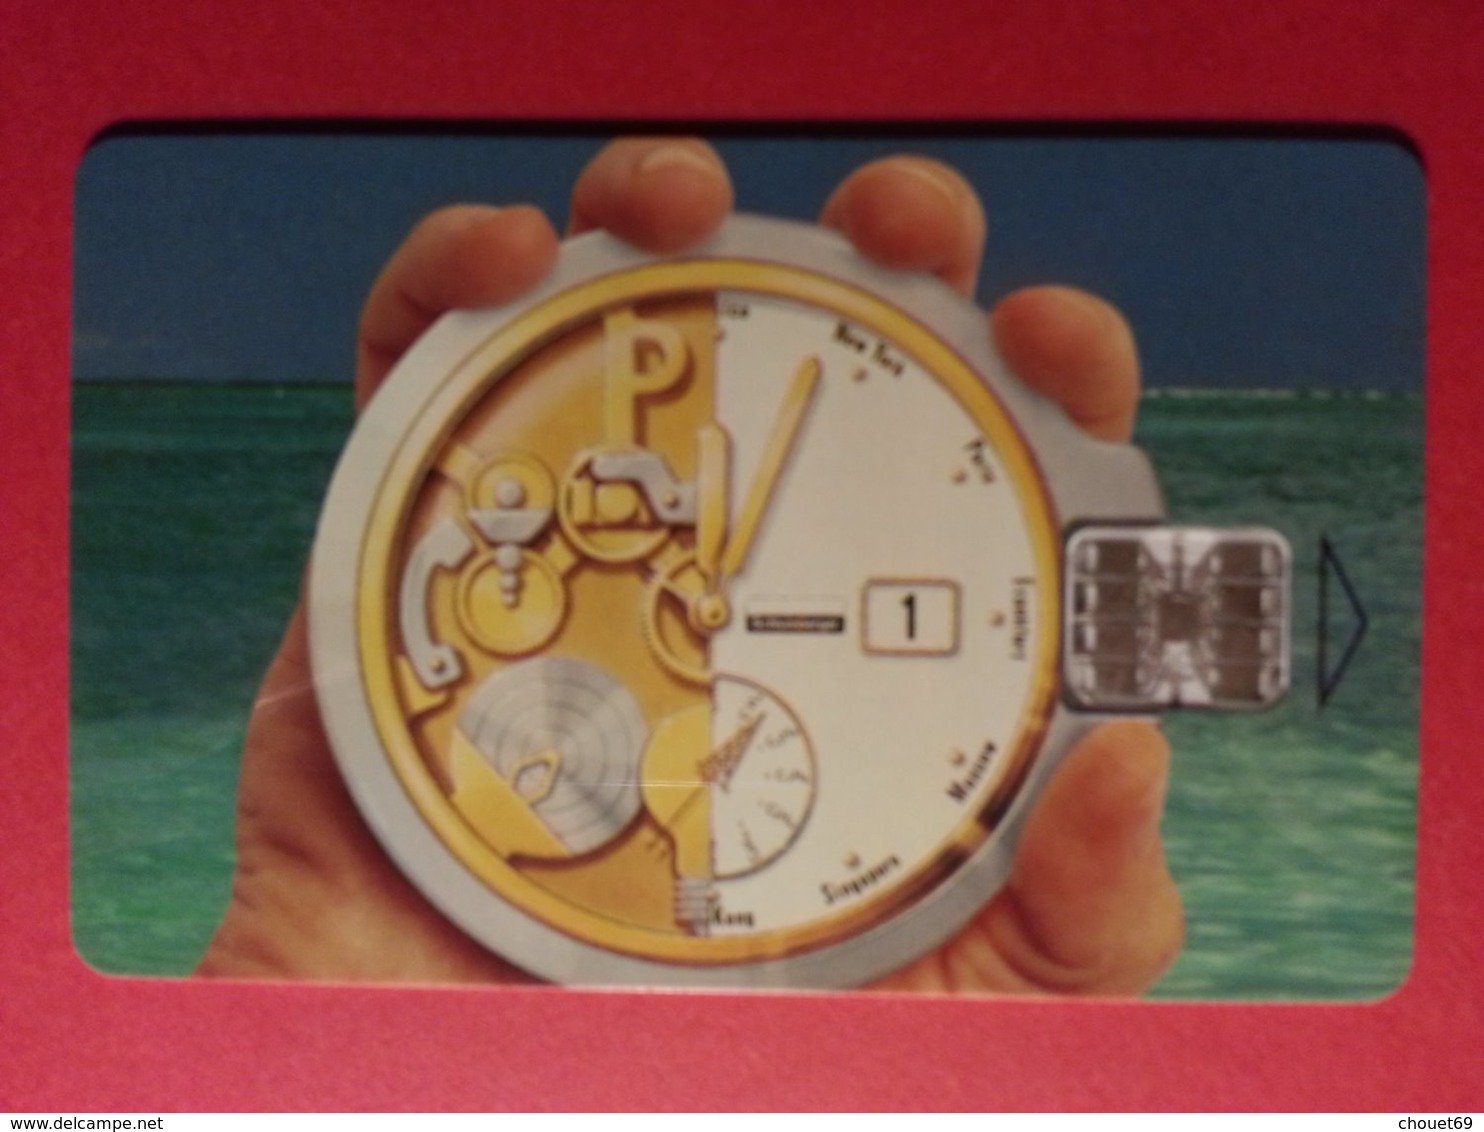 DEMO TEST SCHLUMBERGER Montre SC7 Verso Euan BAIRD (BF1217 - Telefonkarten